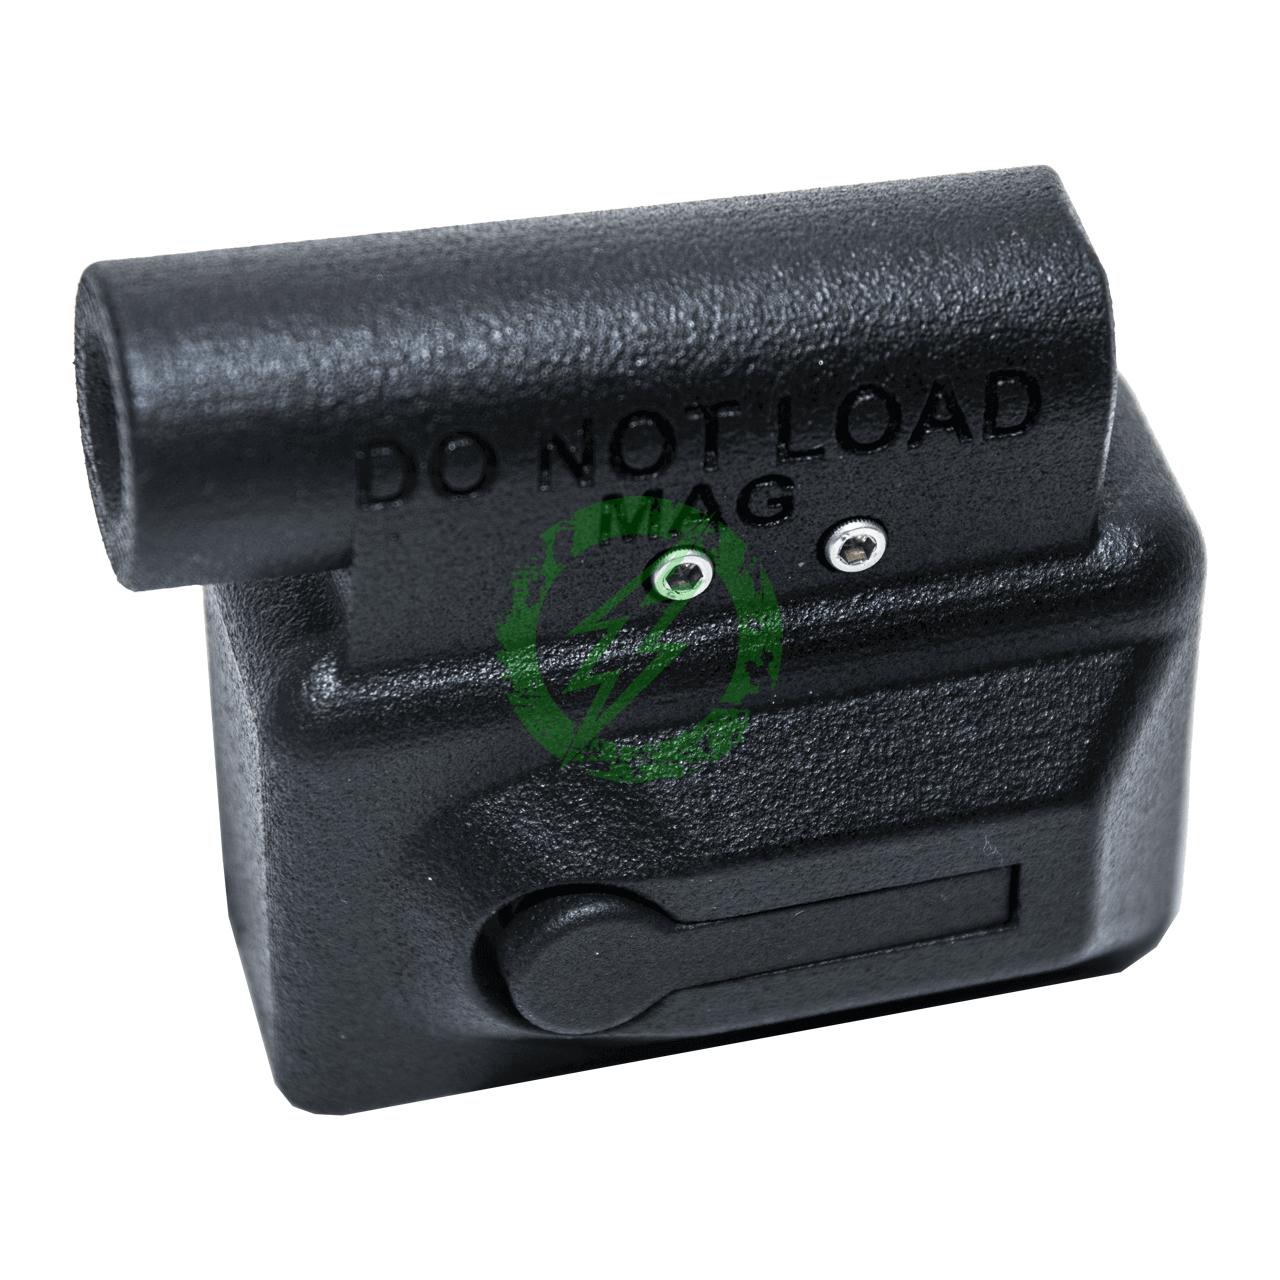 Primary Airsoft M870 M4 Magazine Adapter Back